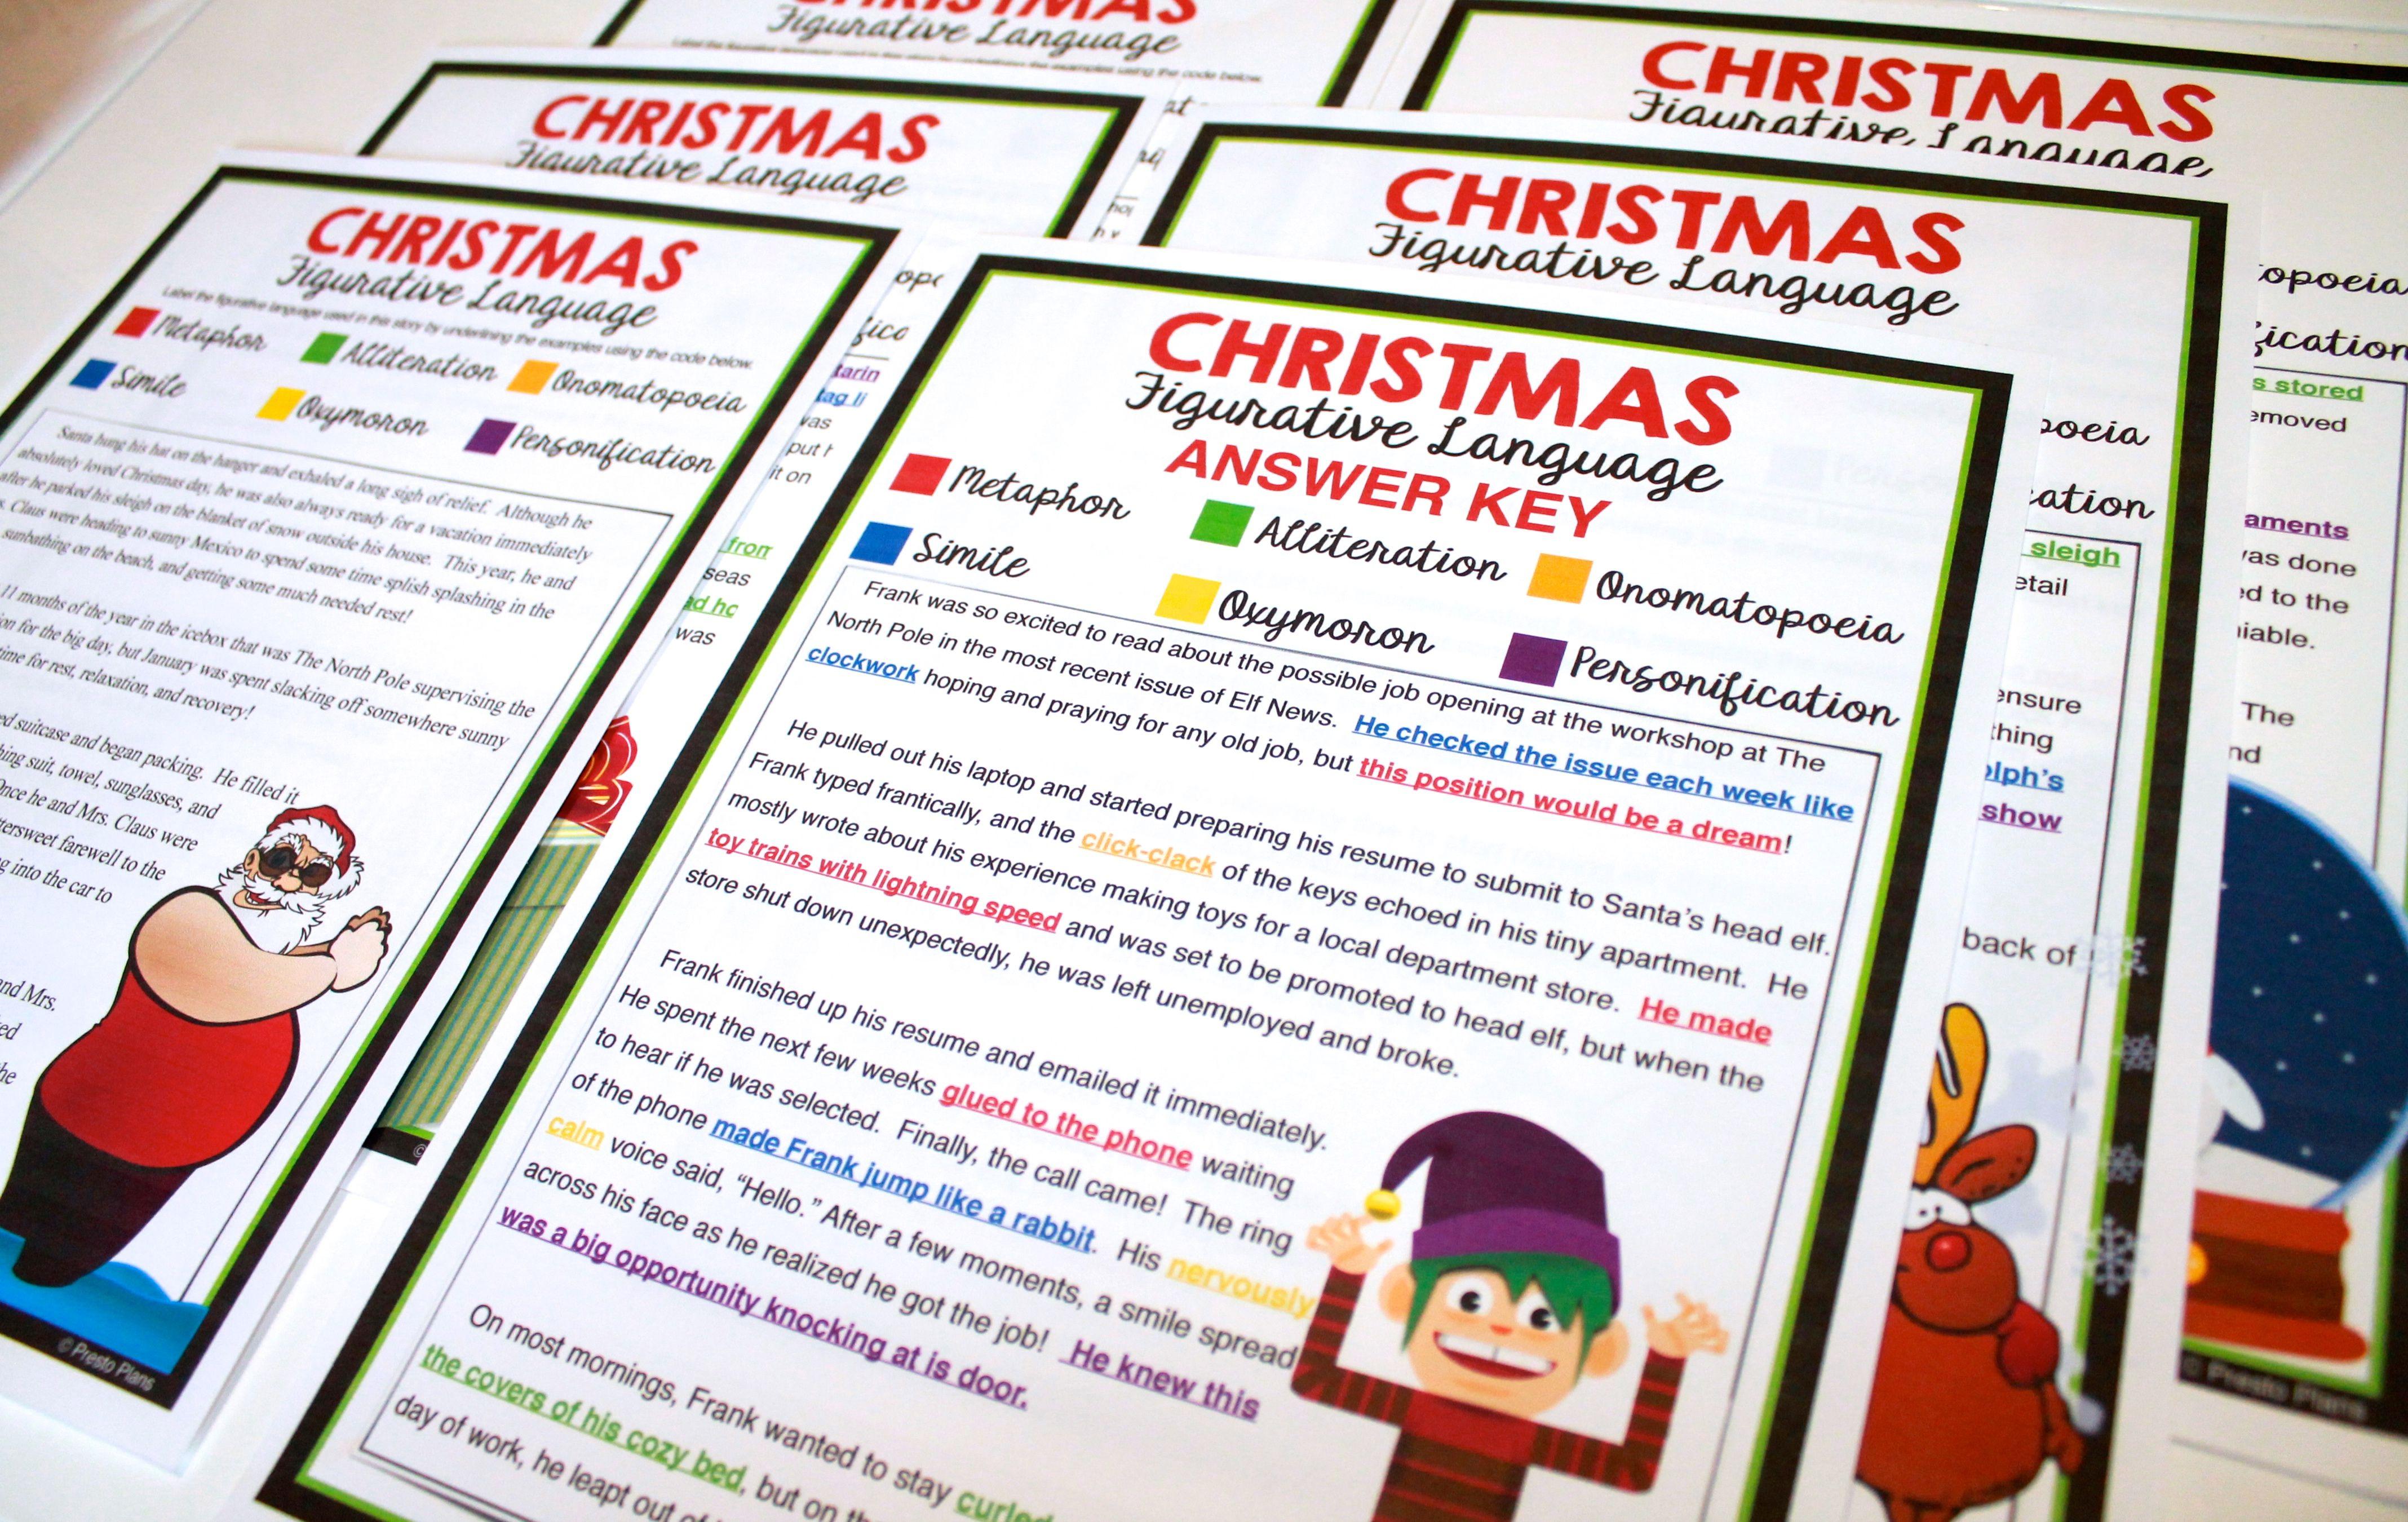 CHRISTMAS FIGURATIVE LANGUAGE - 5 STORIES | Figurative ...